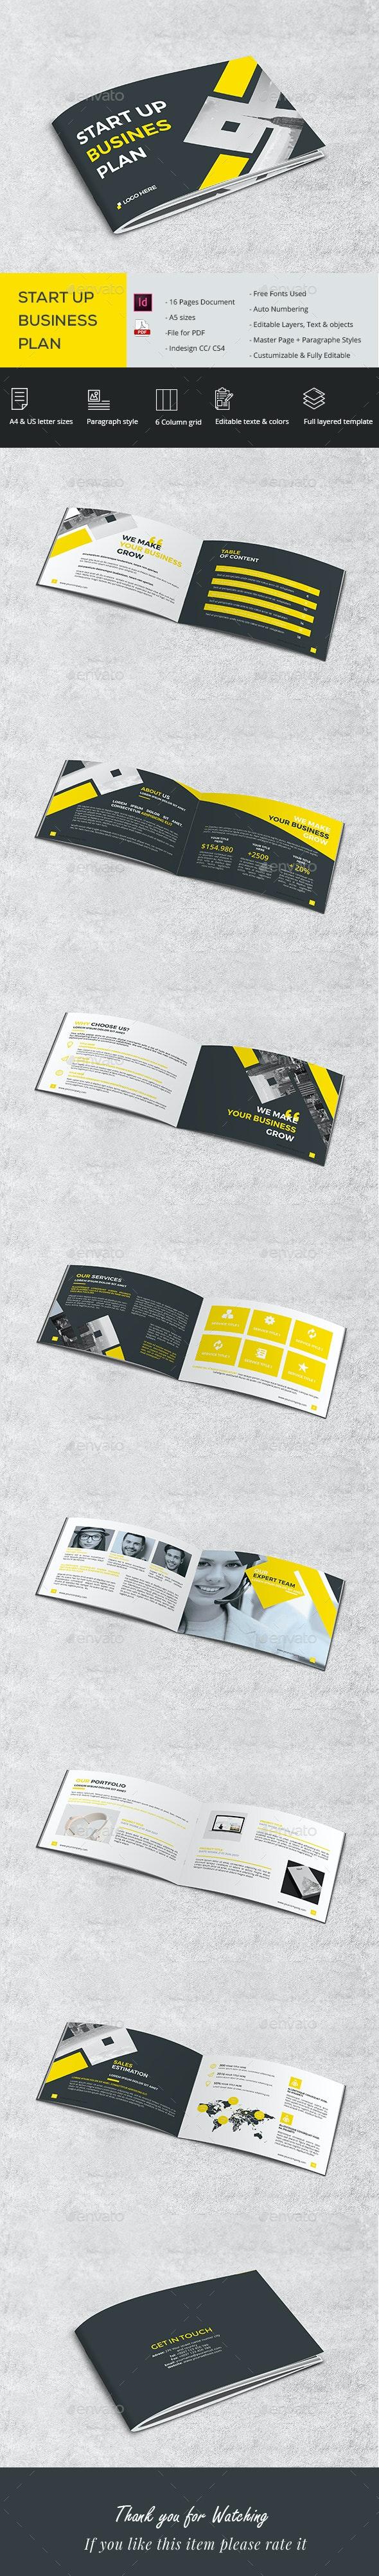 A5 Start Up Brochure - Brochures Print Templates